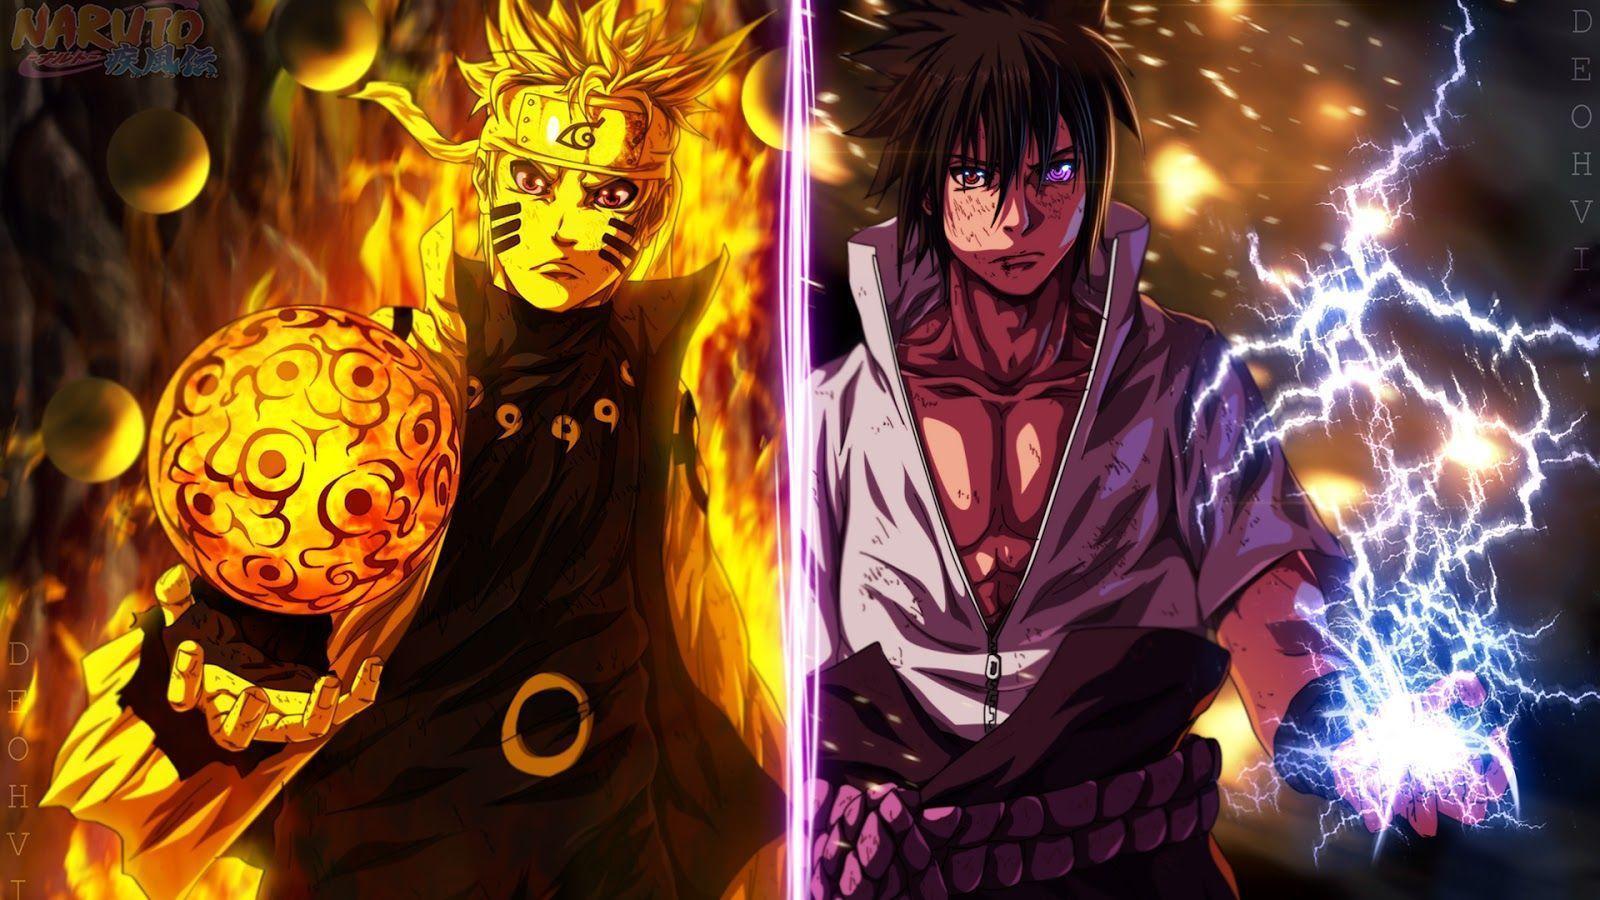 Download 52 Koleksi Wallpaper Naruto Baru HD Terbaru